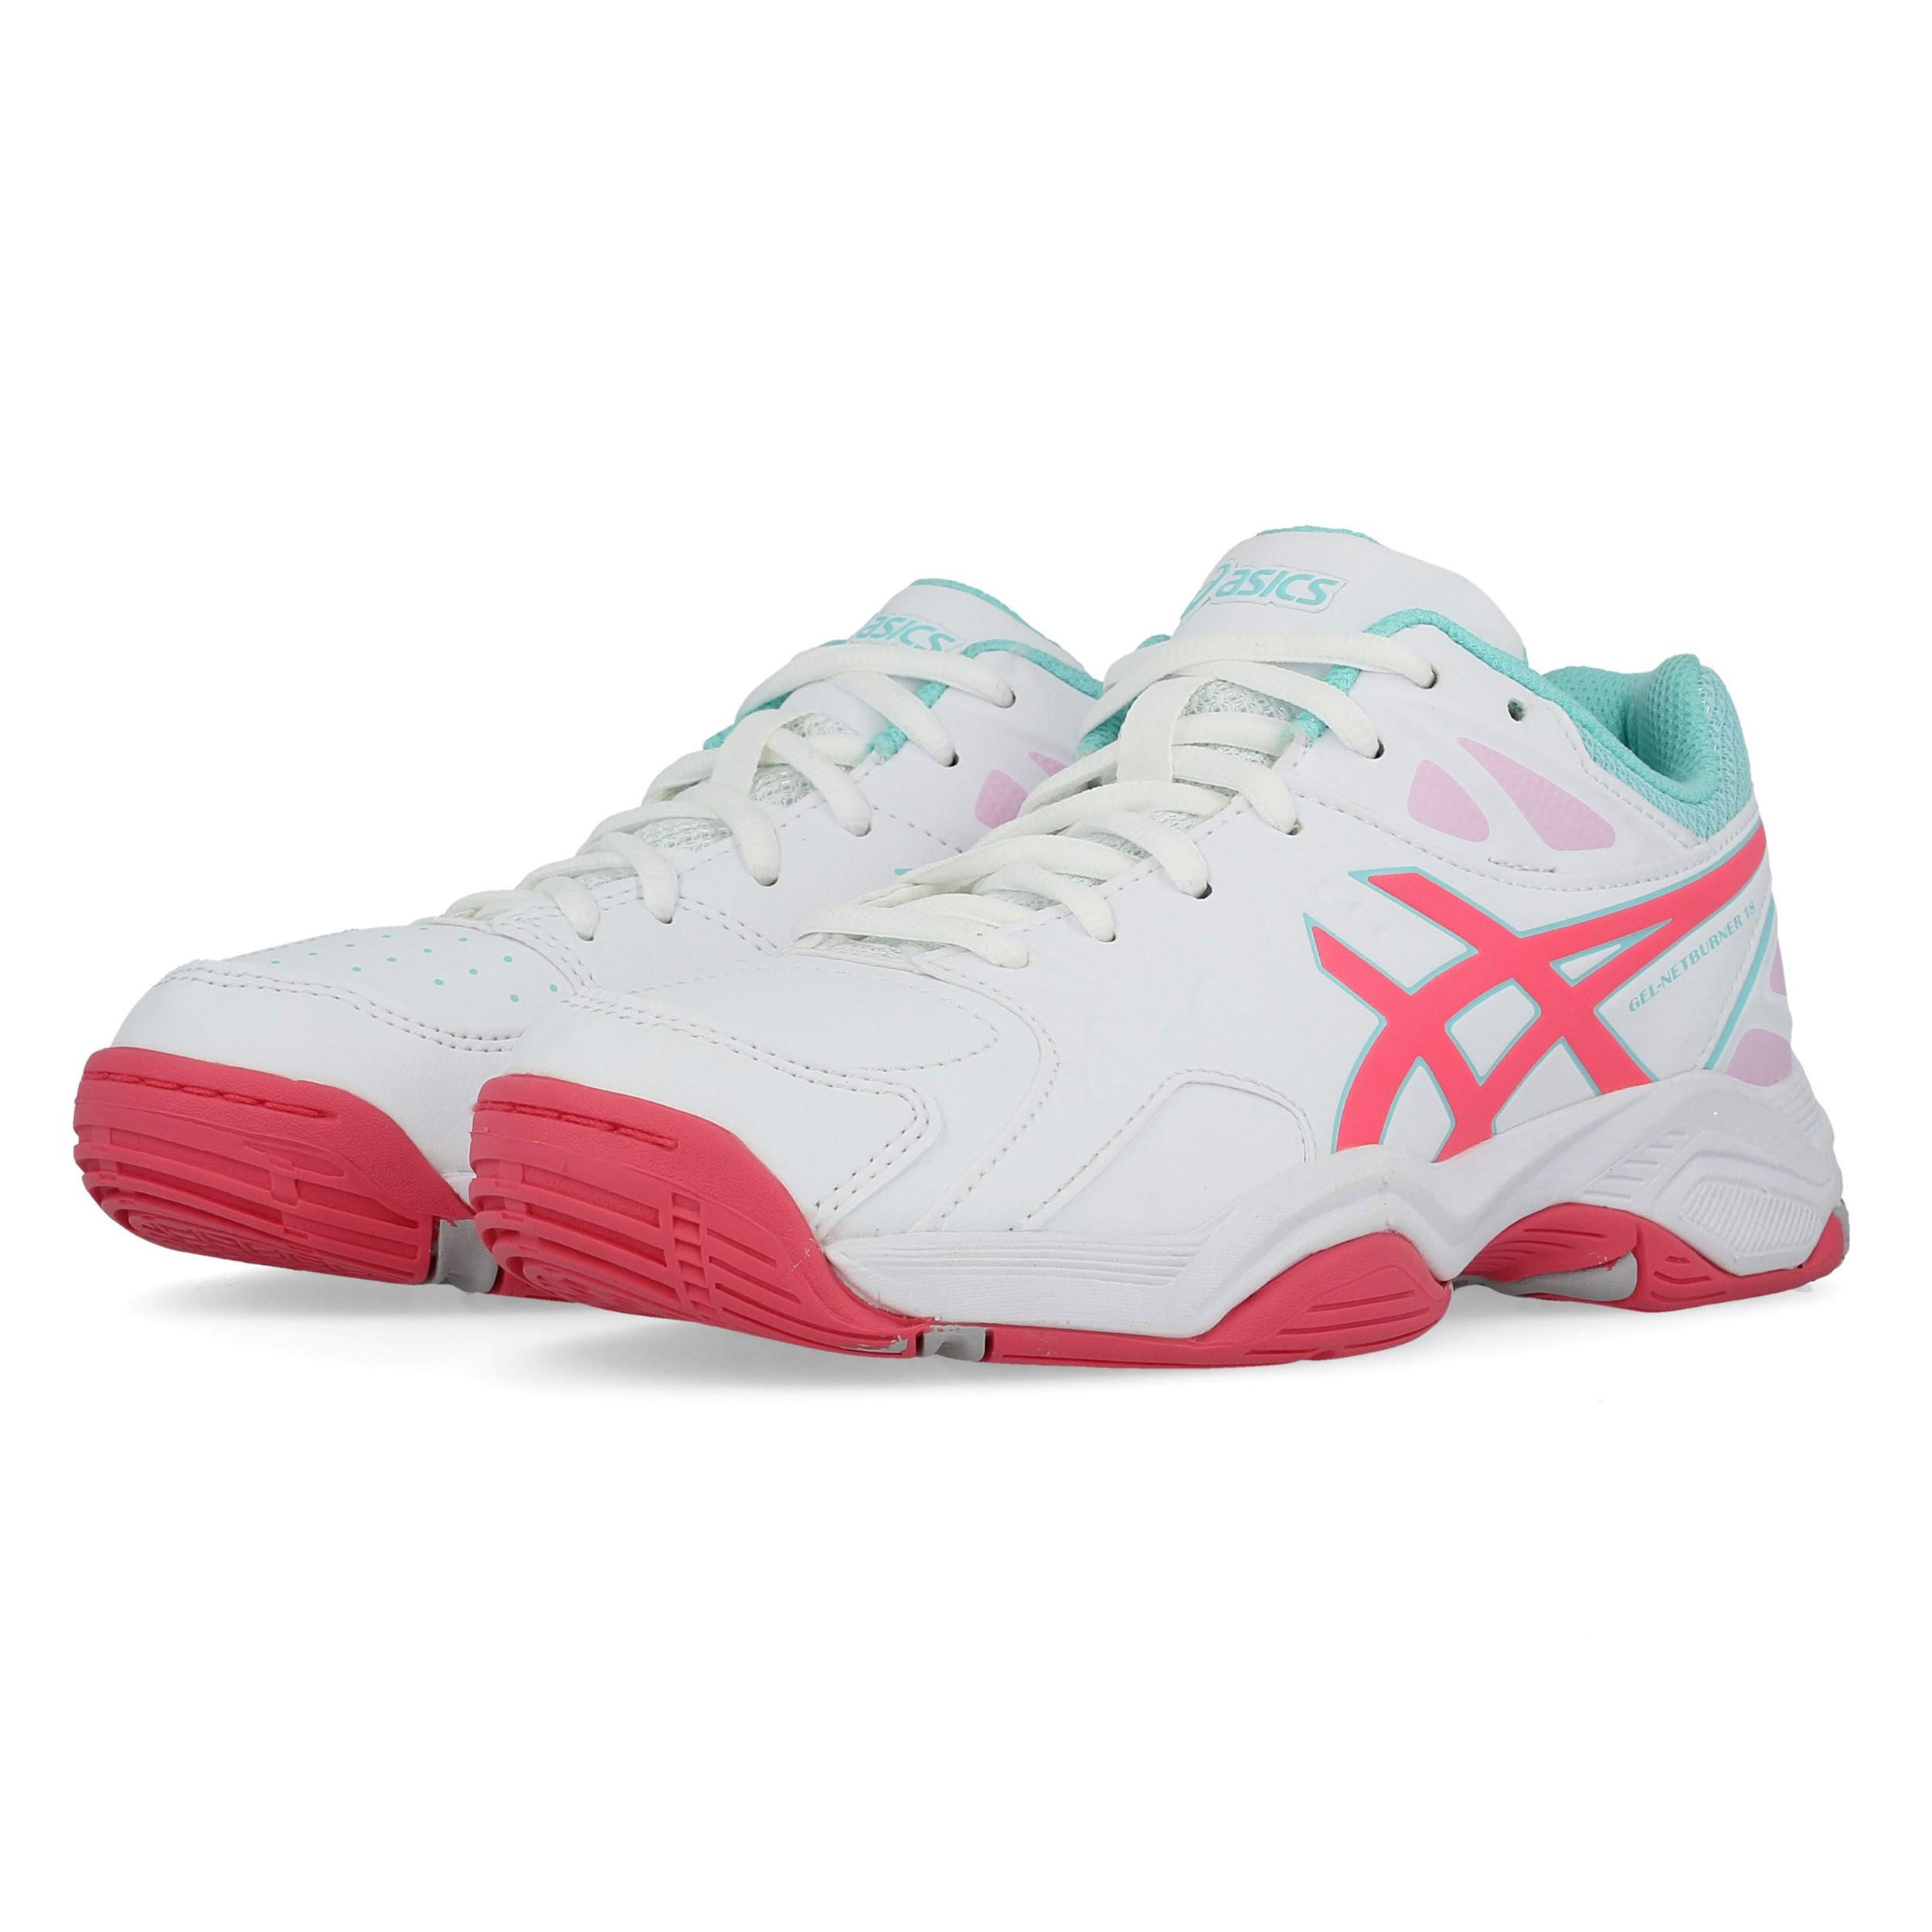 magasin en ligne 73ffe 382f1 Details about Asics Junior Gel-Netburner 18 GS Netball Shoes White Sports  Breathable